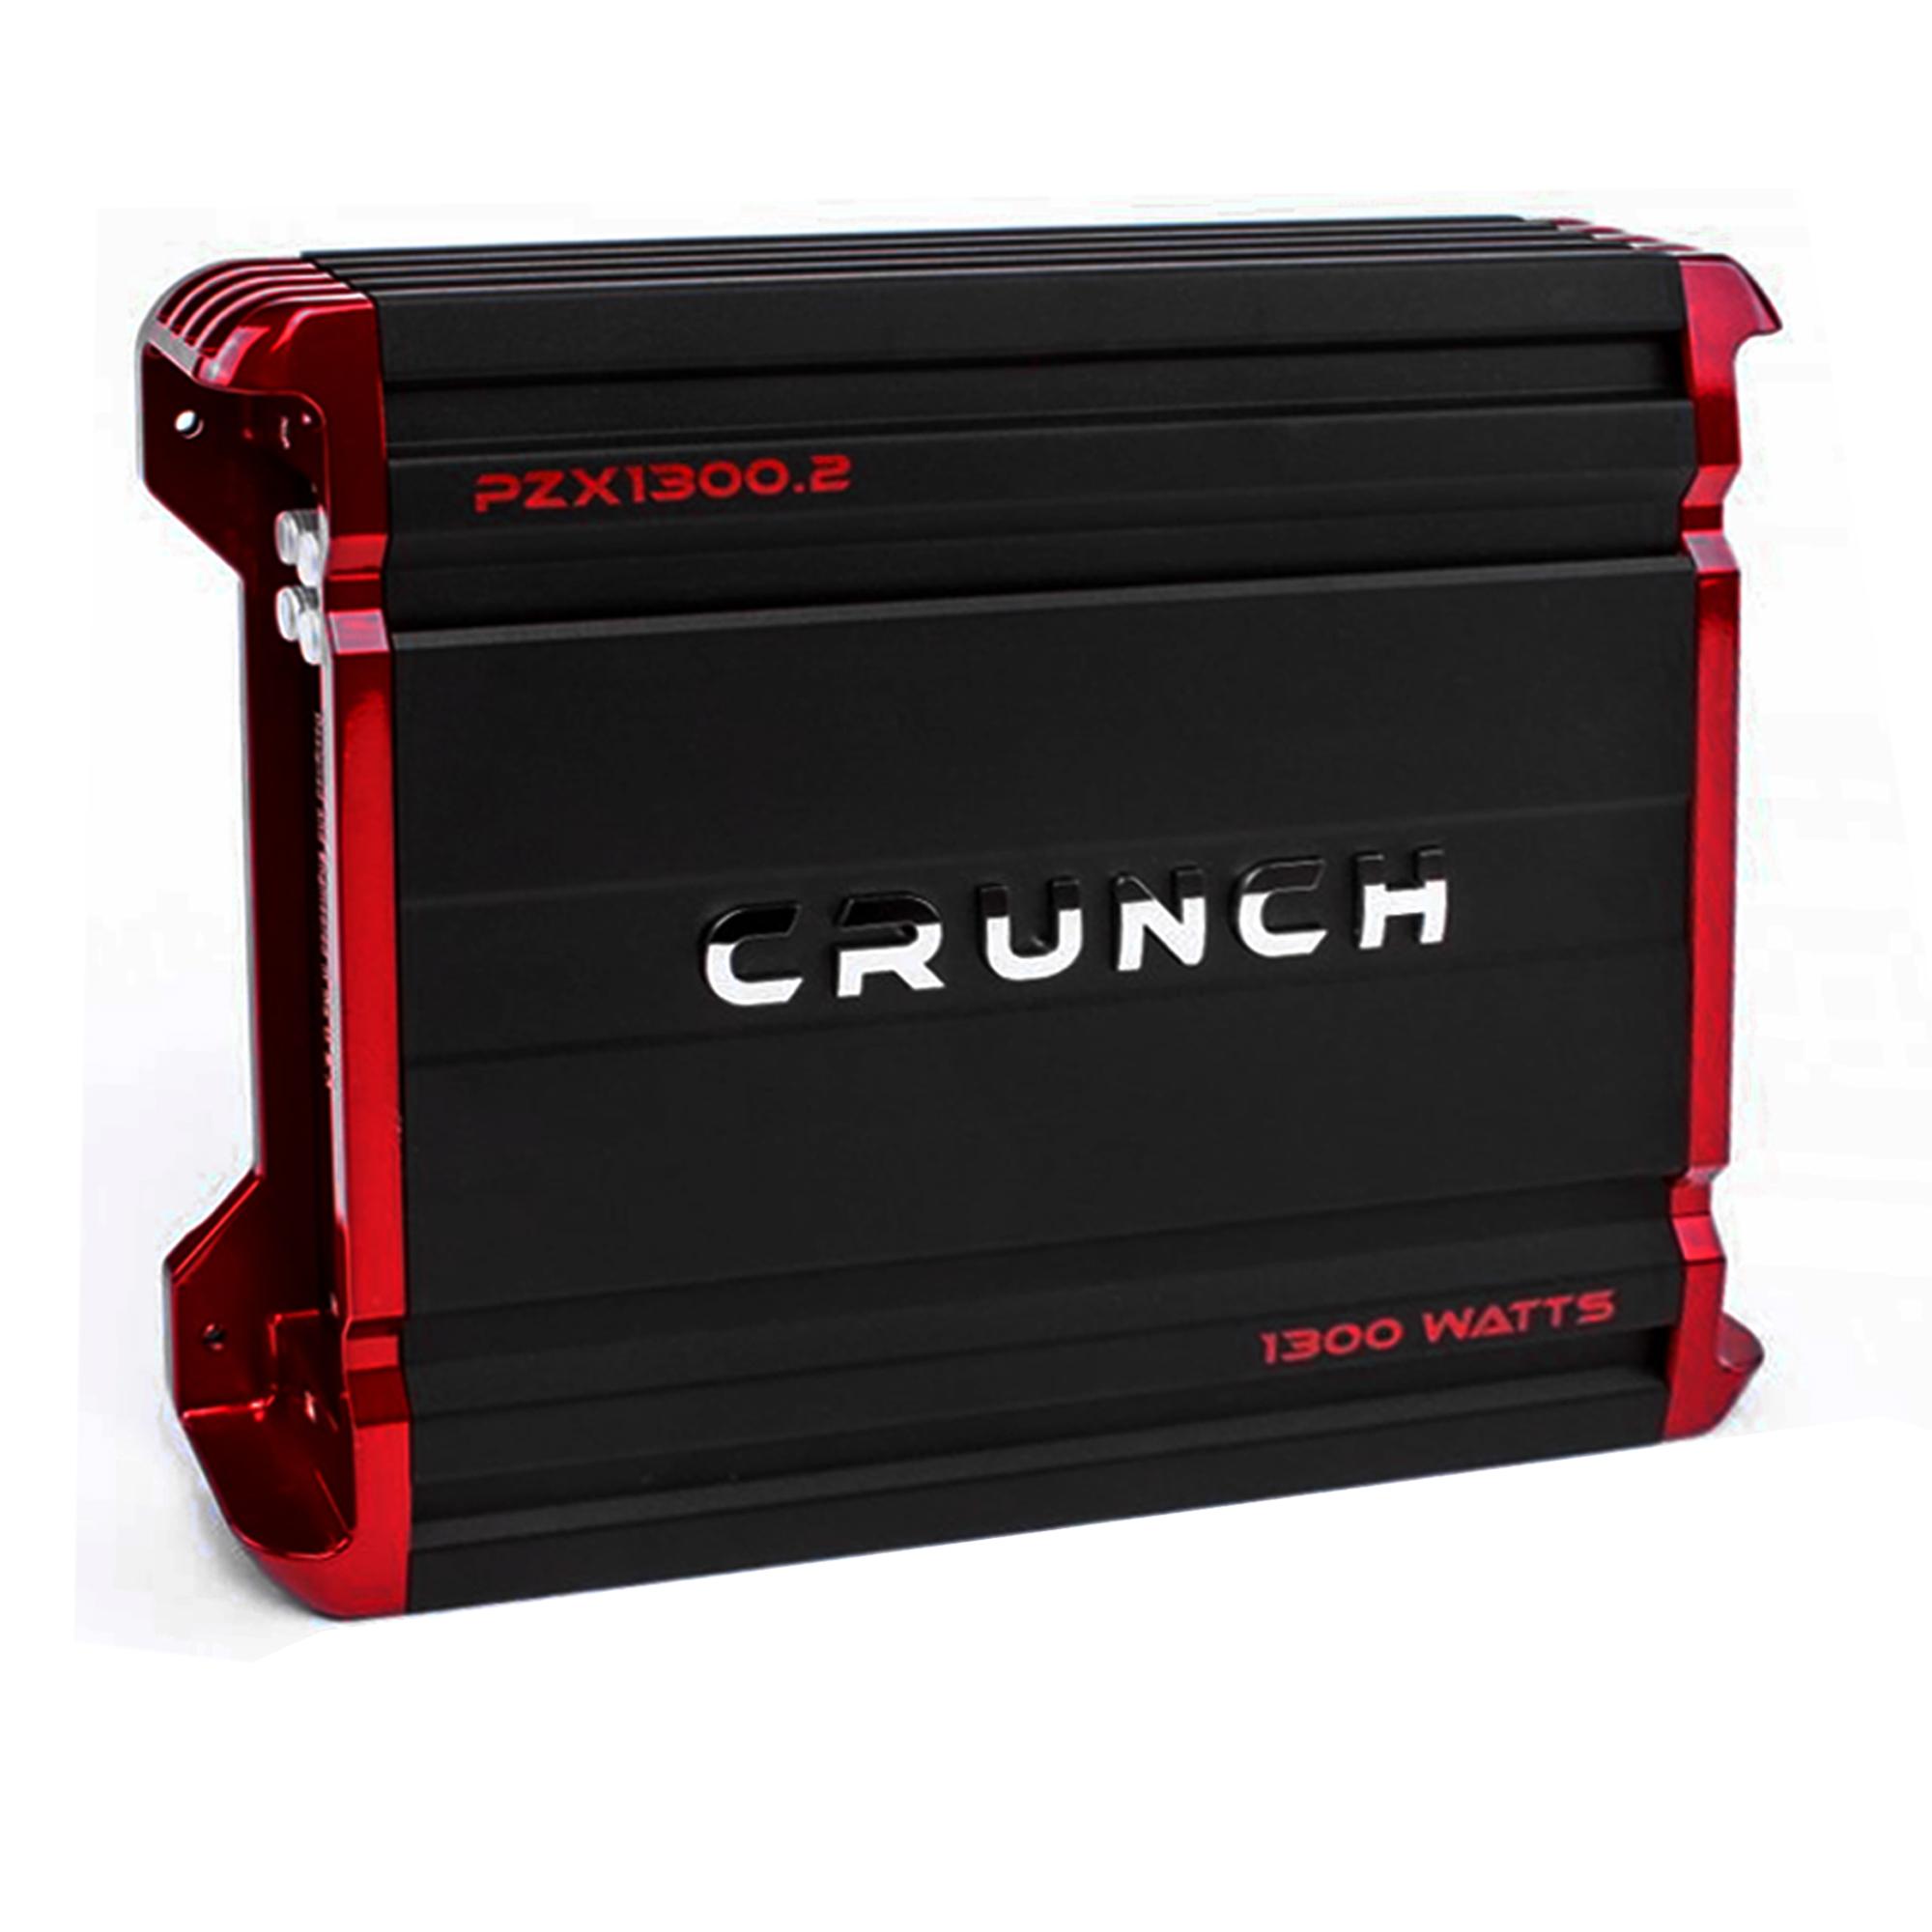 Crunch PZX1300.2 1300W 2-Channel Powerzone Series Class AB Car Amplifier